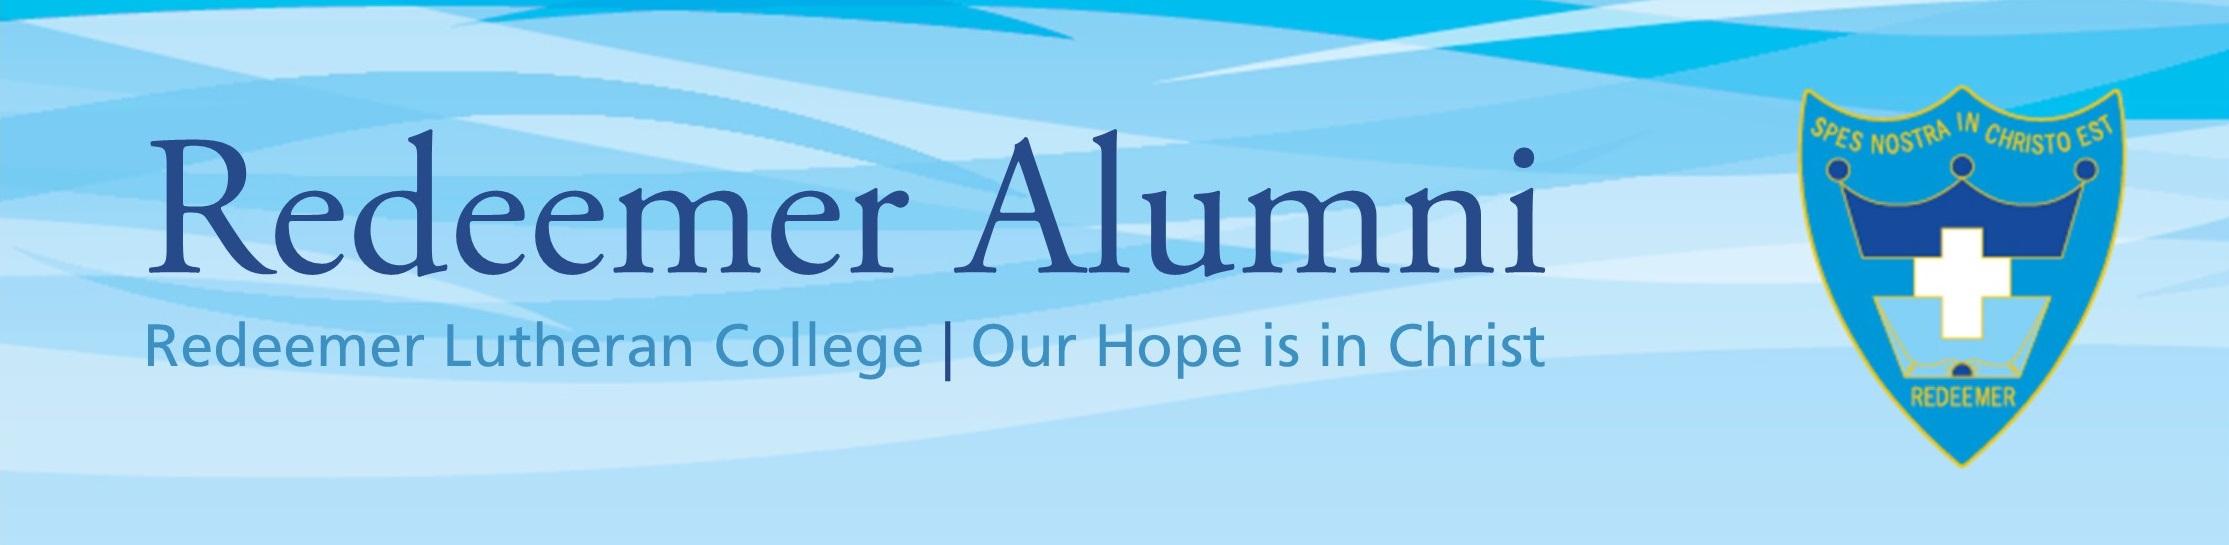 Redeemer Alumni Web Header V2